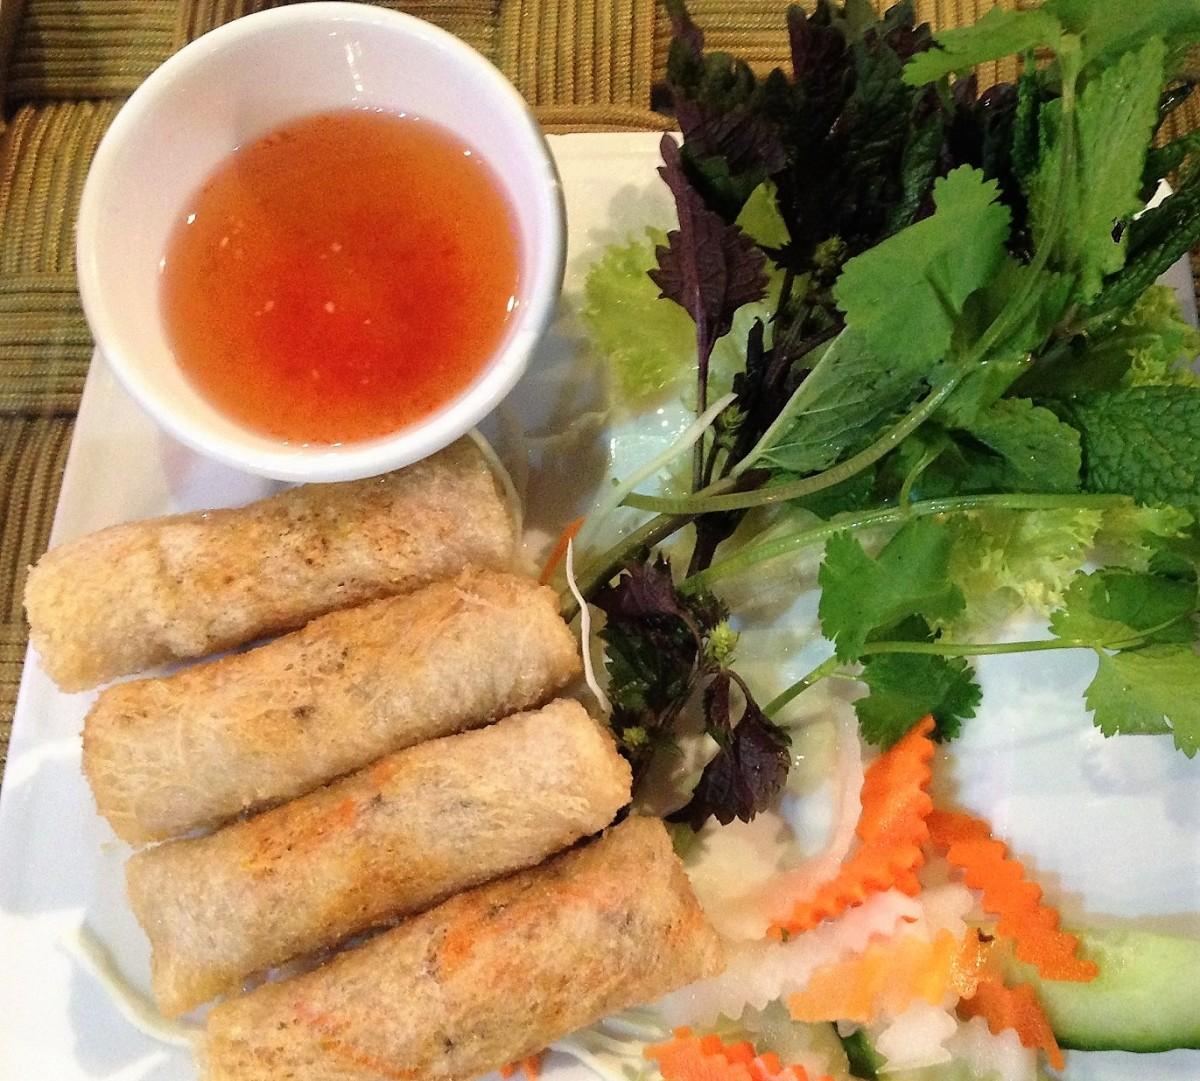 Vietnamese cuisine in a nice family restaurant